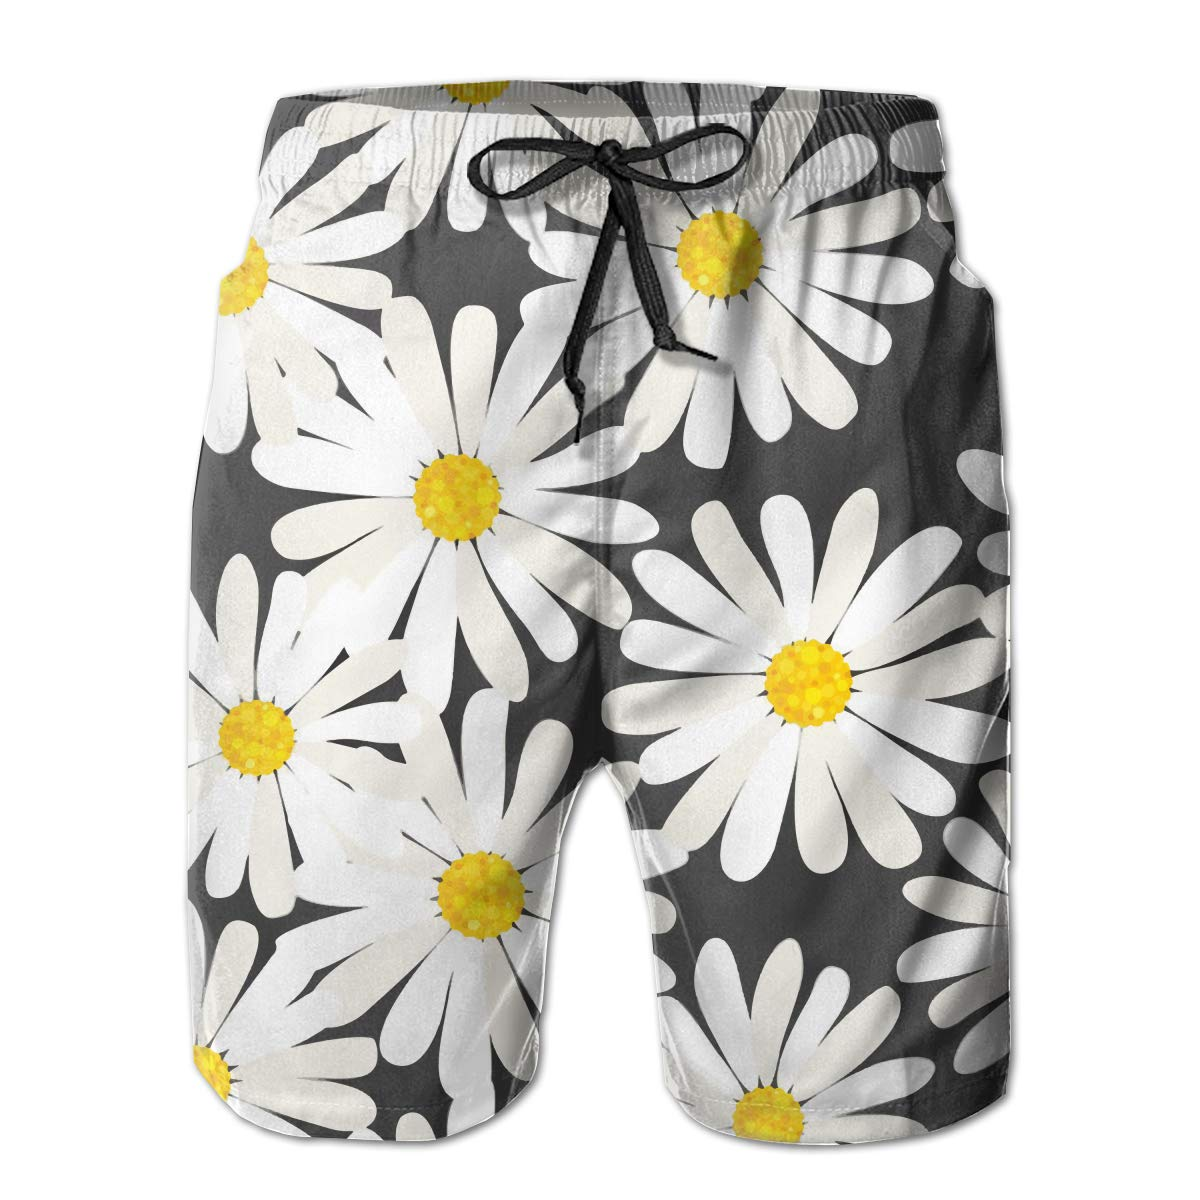 MIPU SHANGMAO Mens Little Daisy Summer Beach Shorts Leisure Quick Dry Swimming Pants